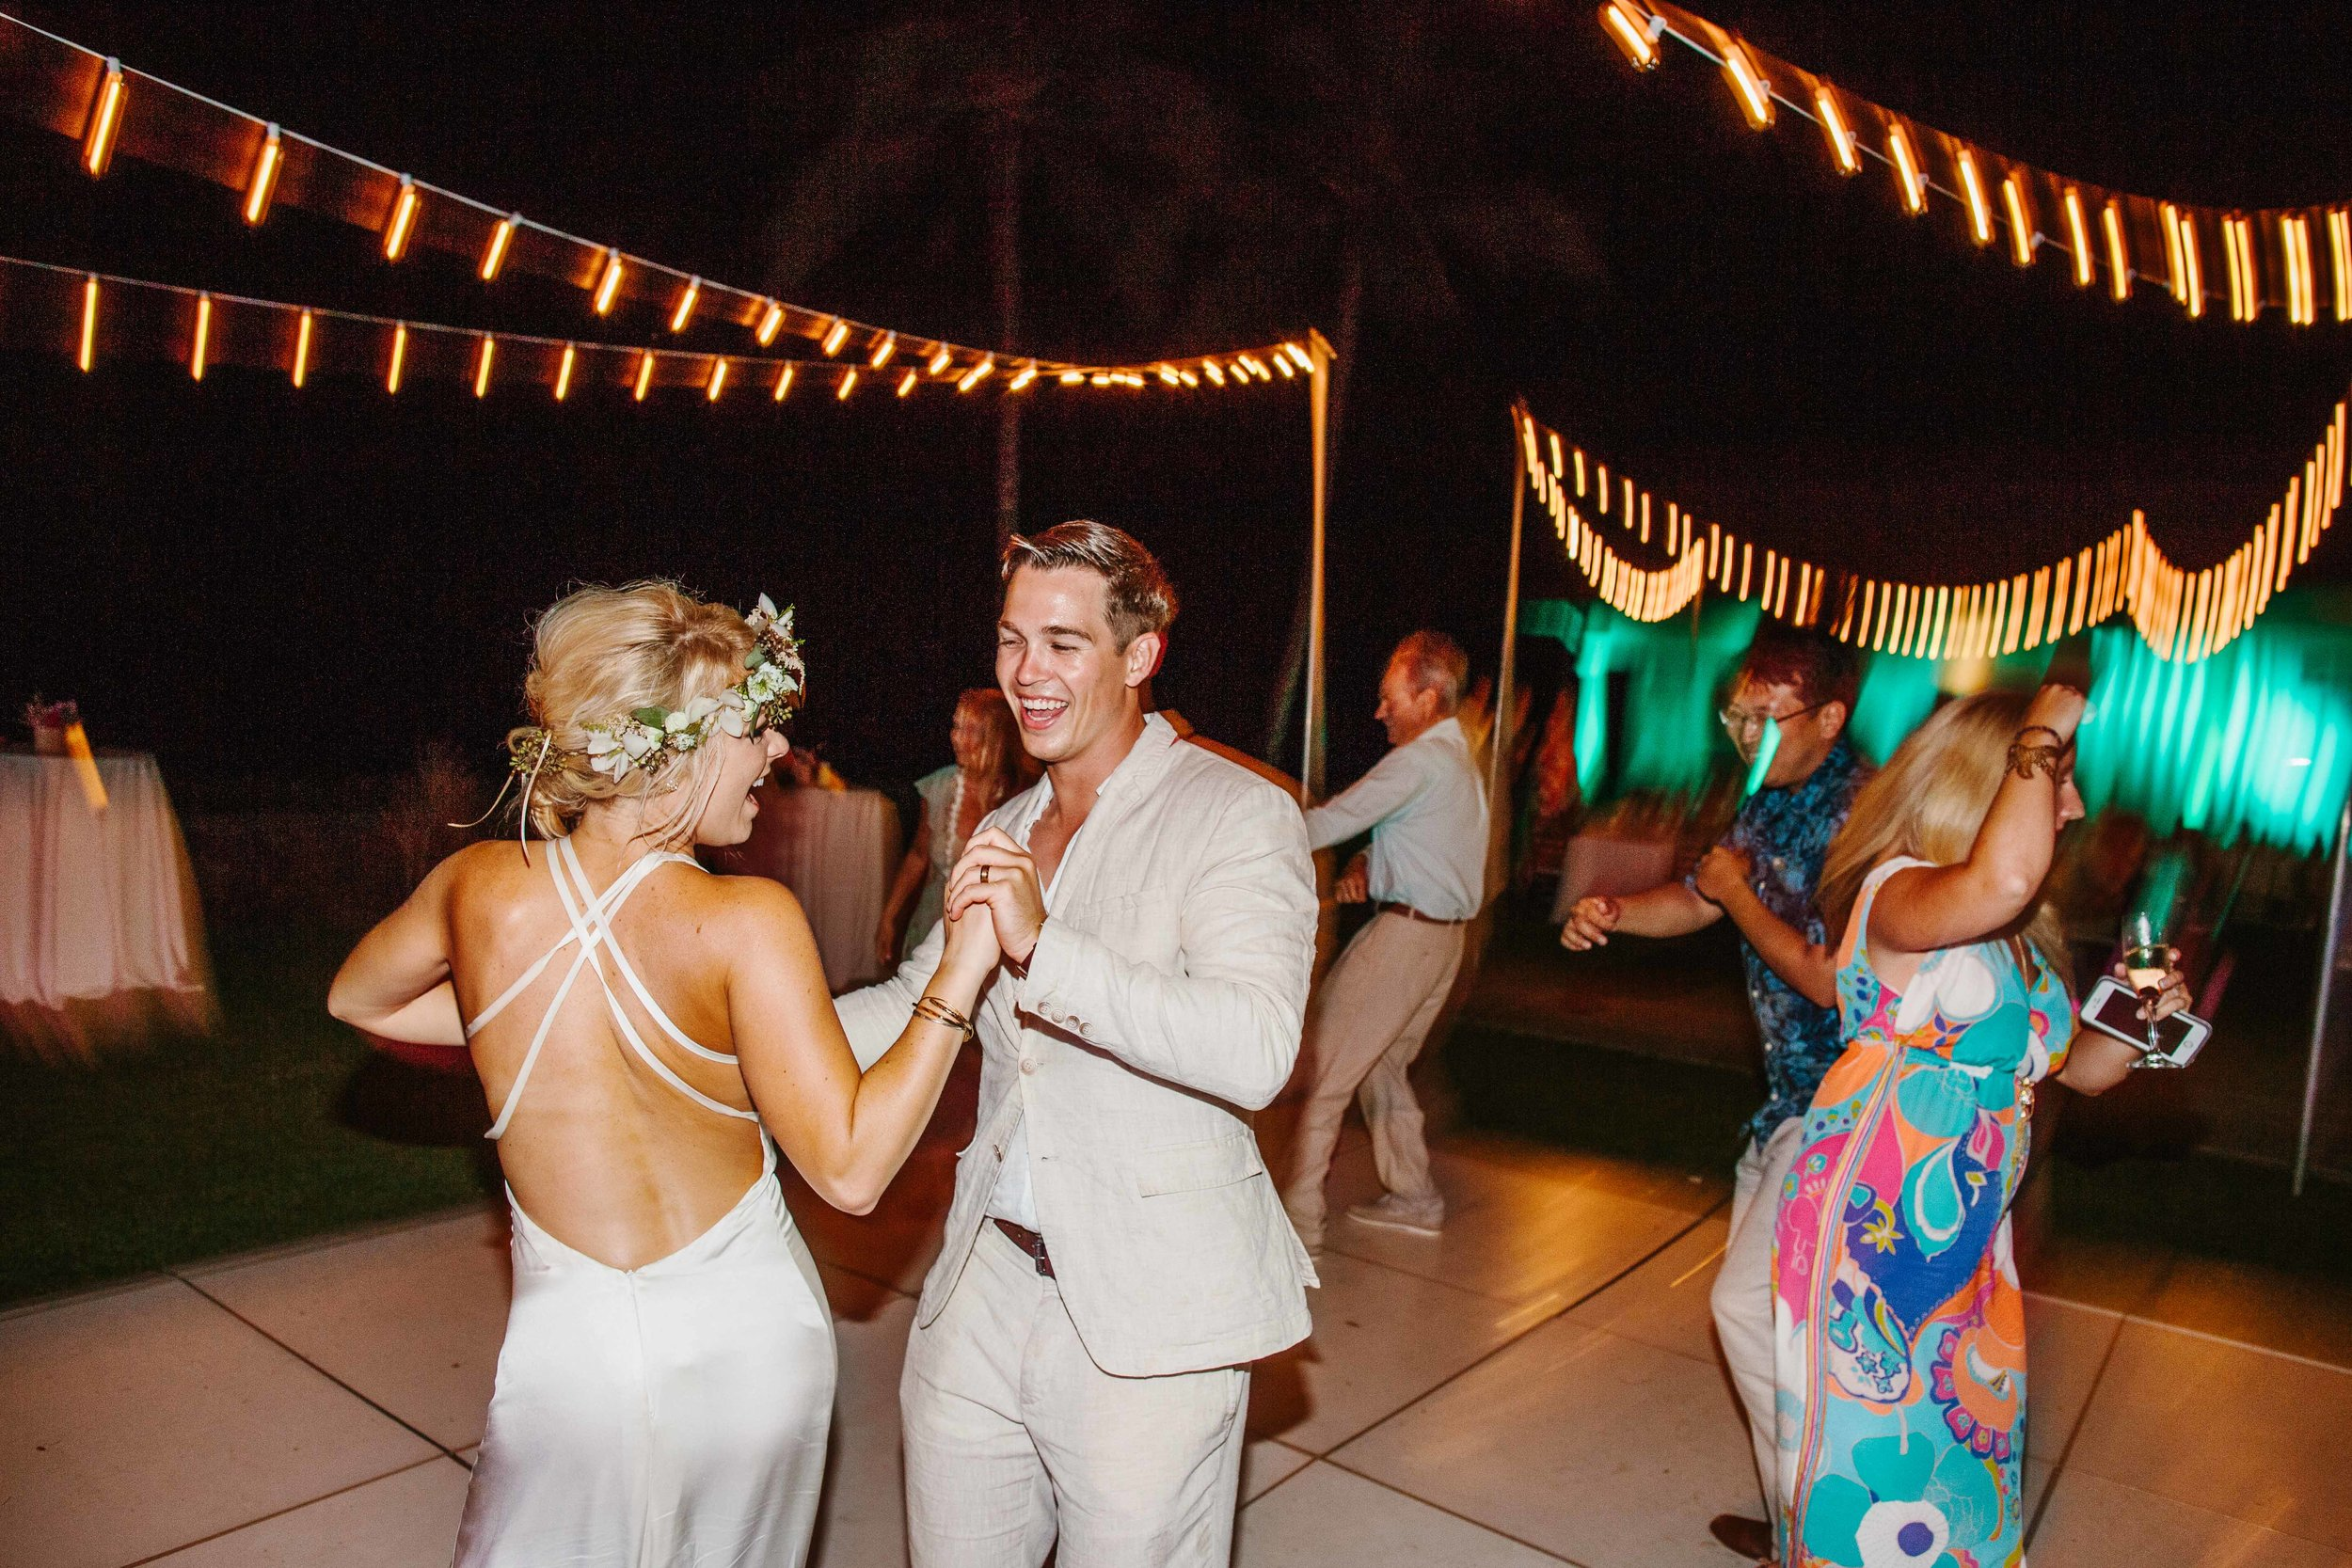 Wedding Couple Celebrates on The Dance Floor